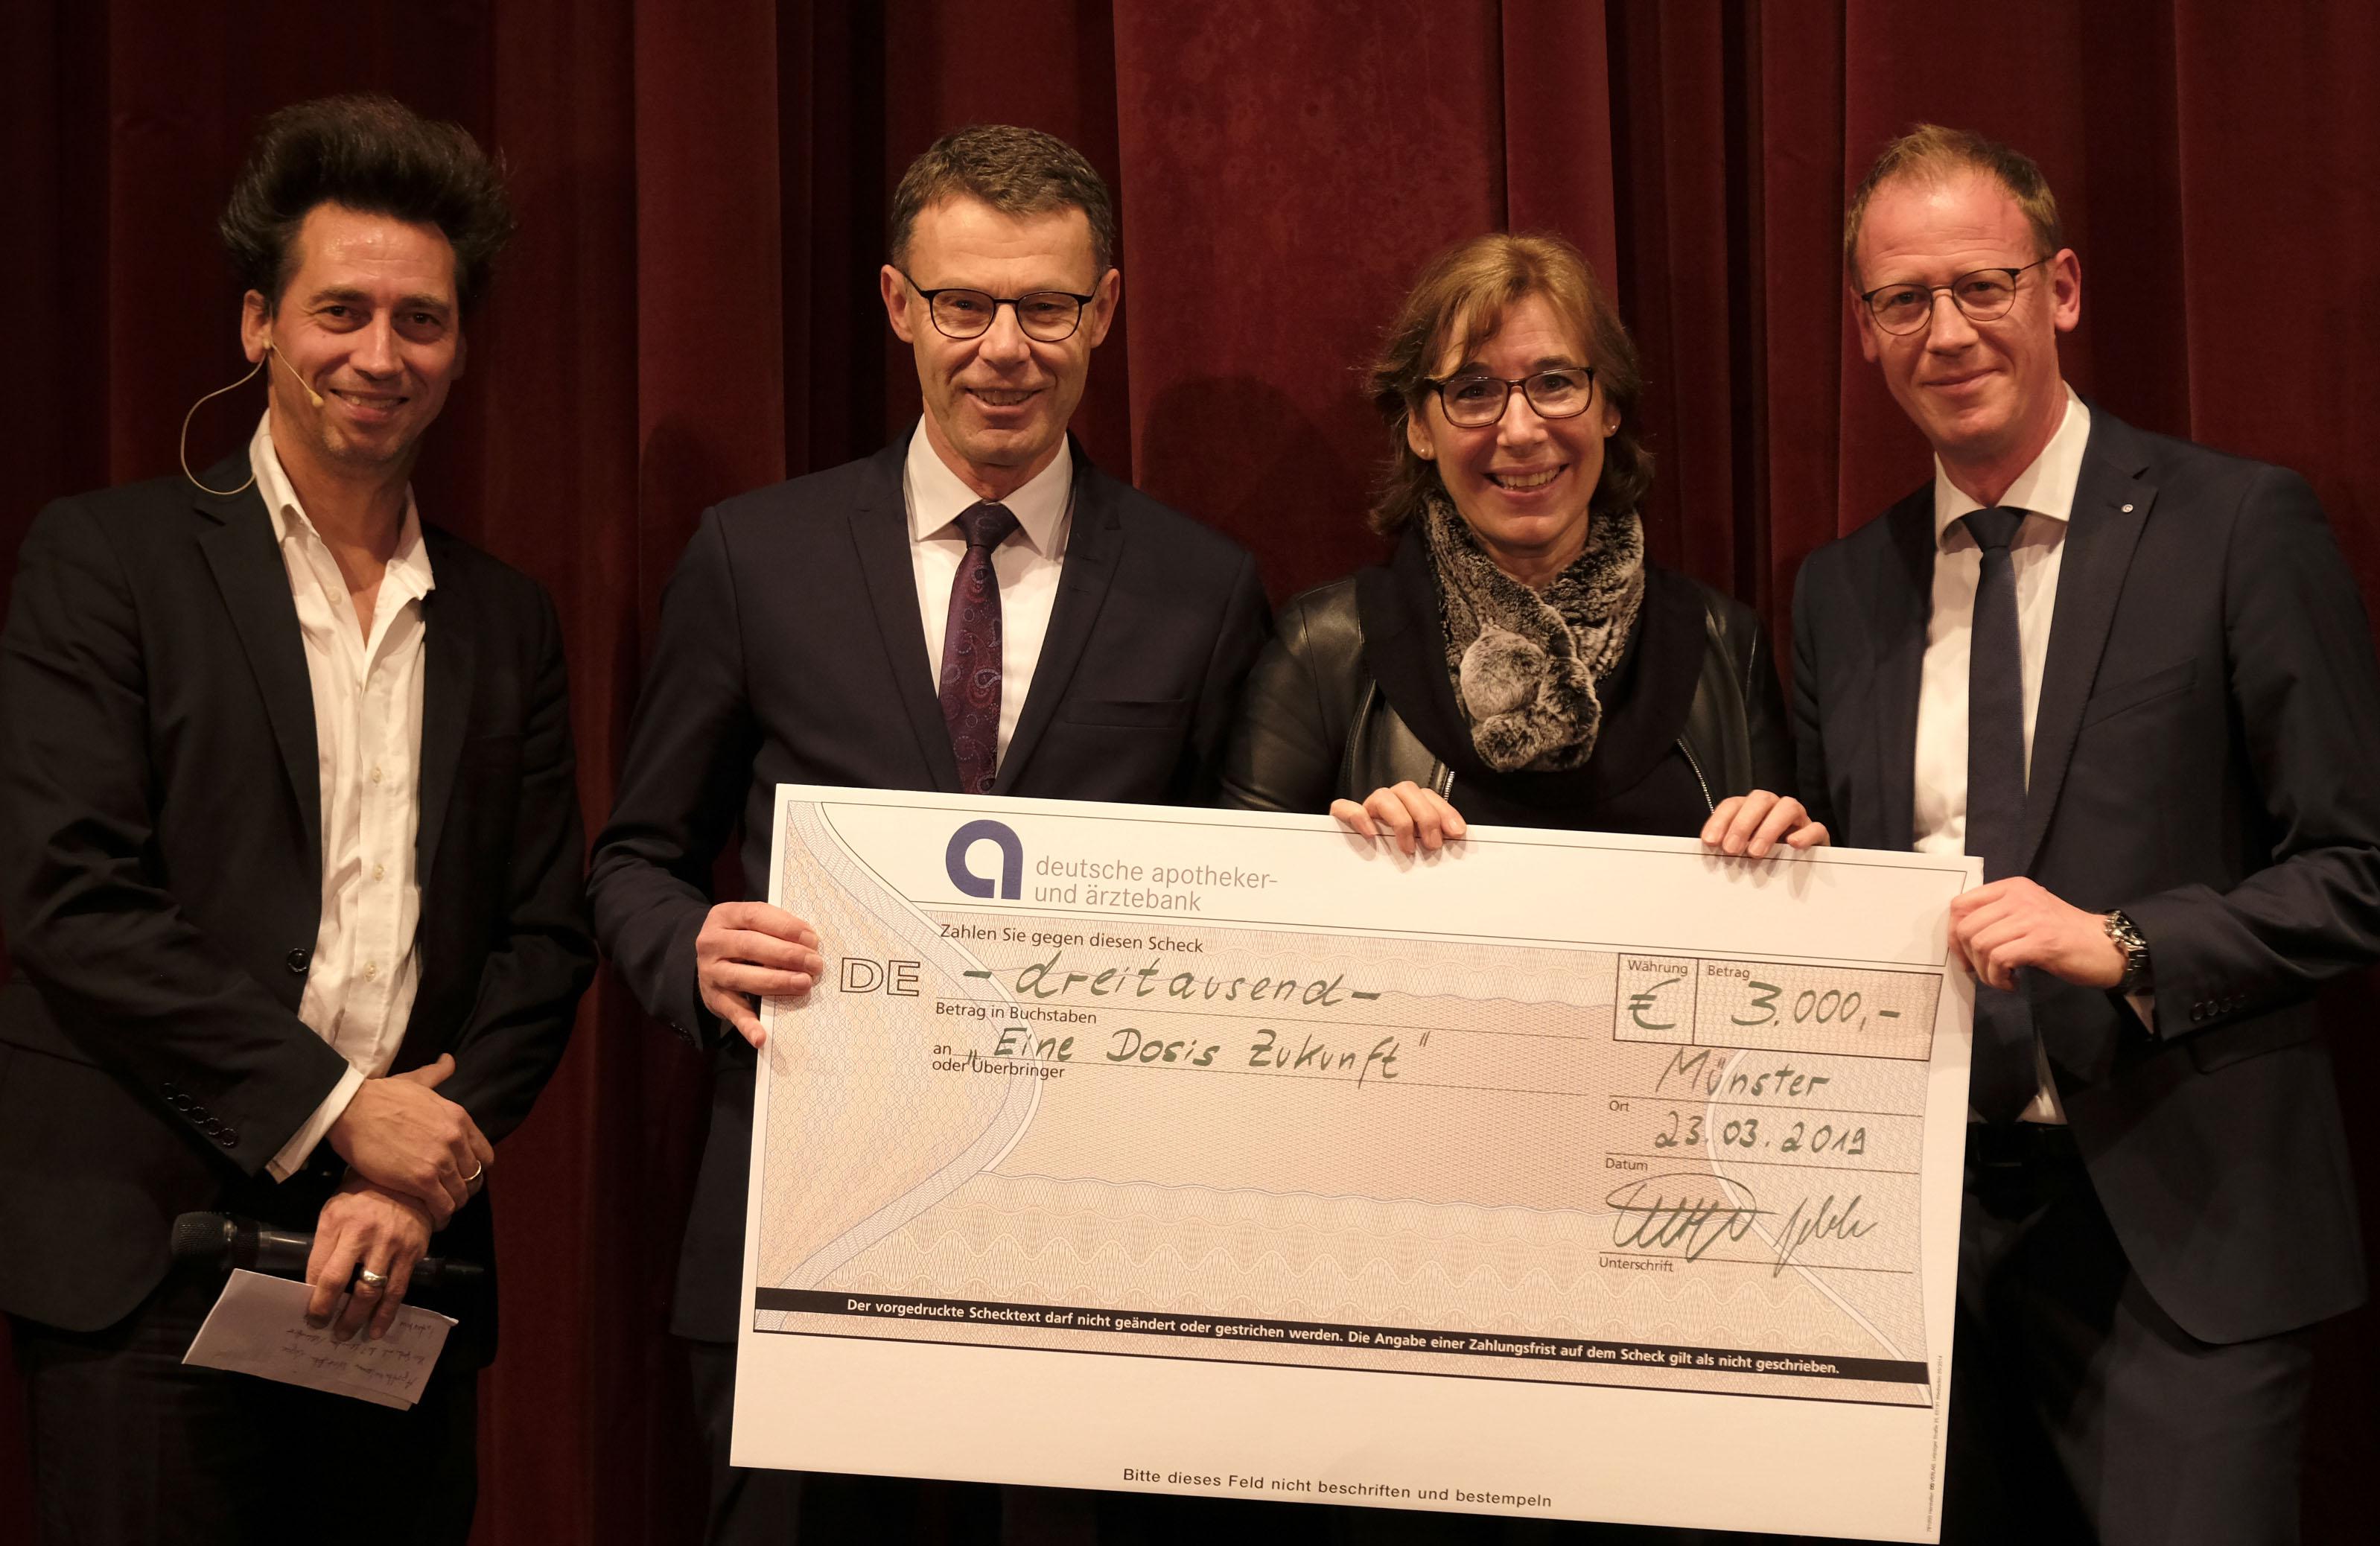 Kammerpräsident nimmt Scheck über 3.000 Euro entgegen